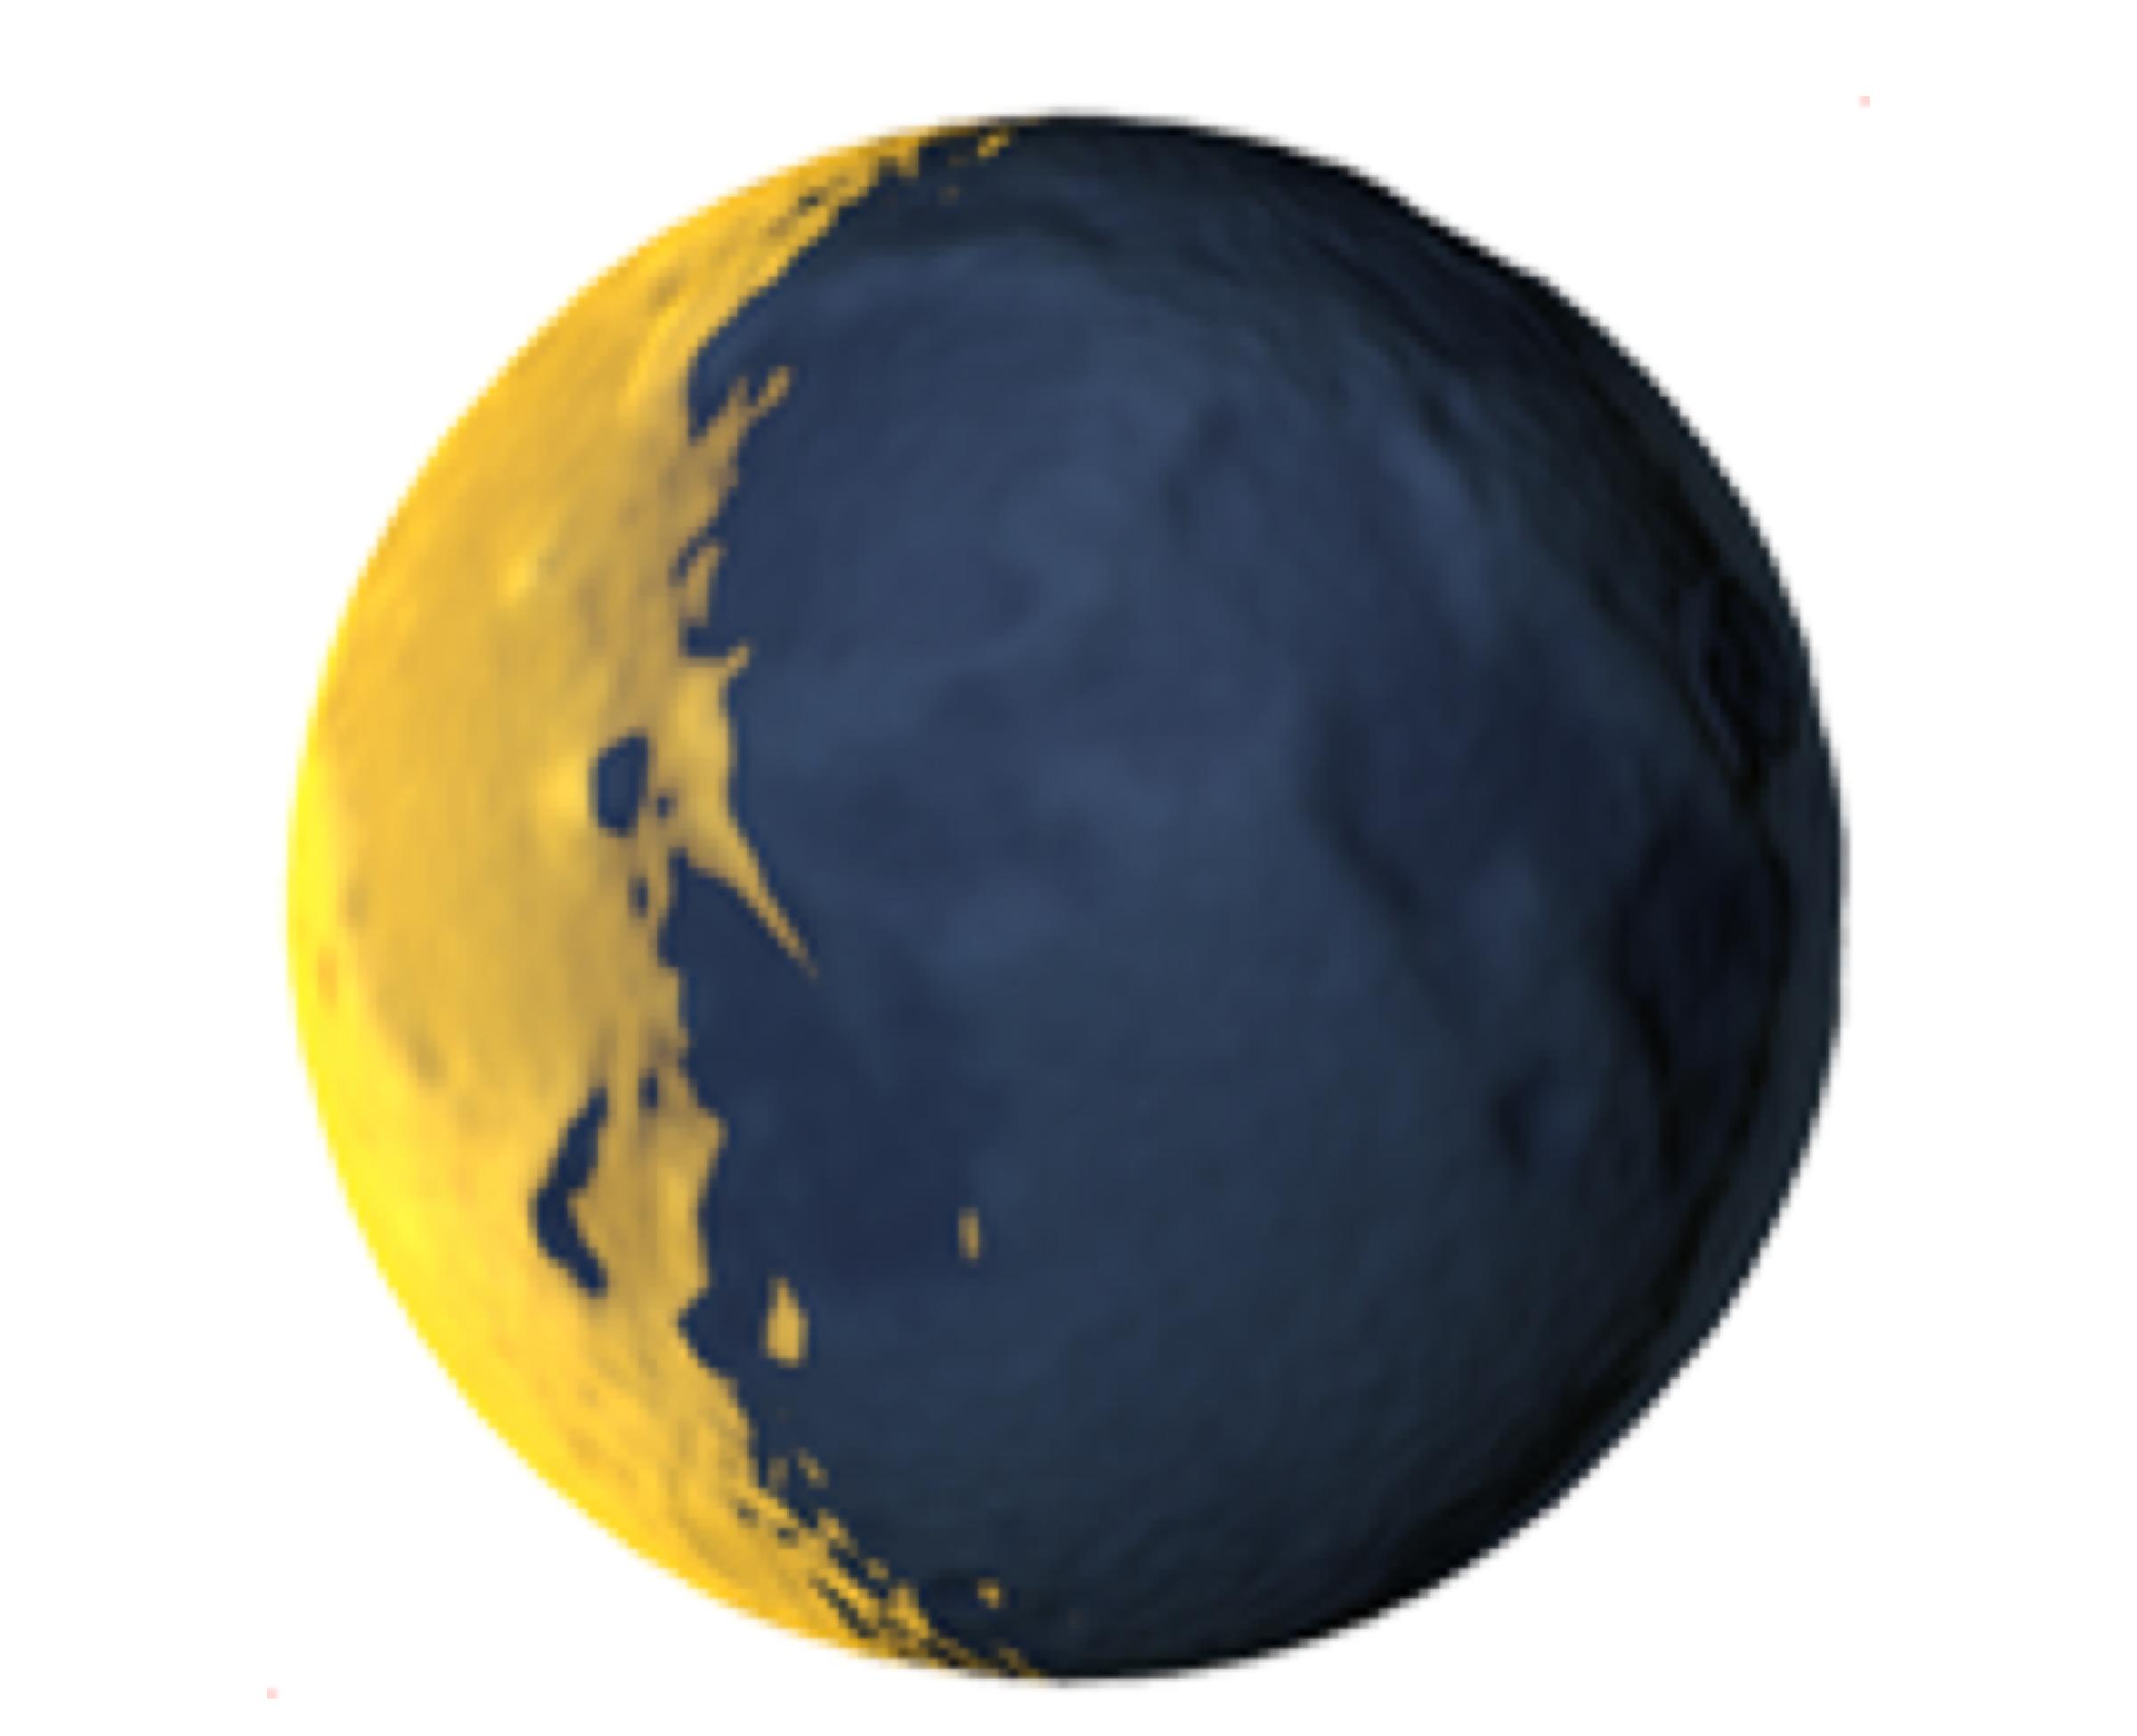 Waning crescent moon (🌘)